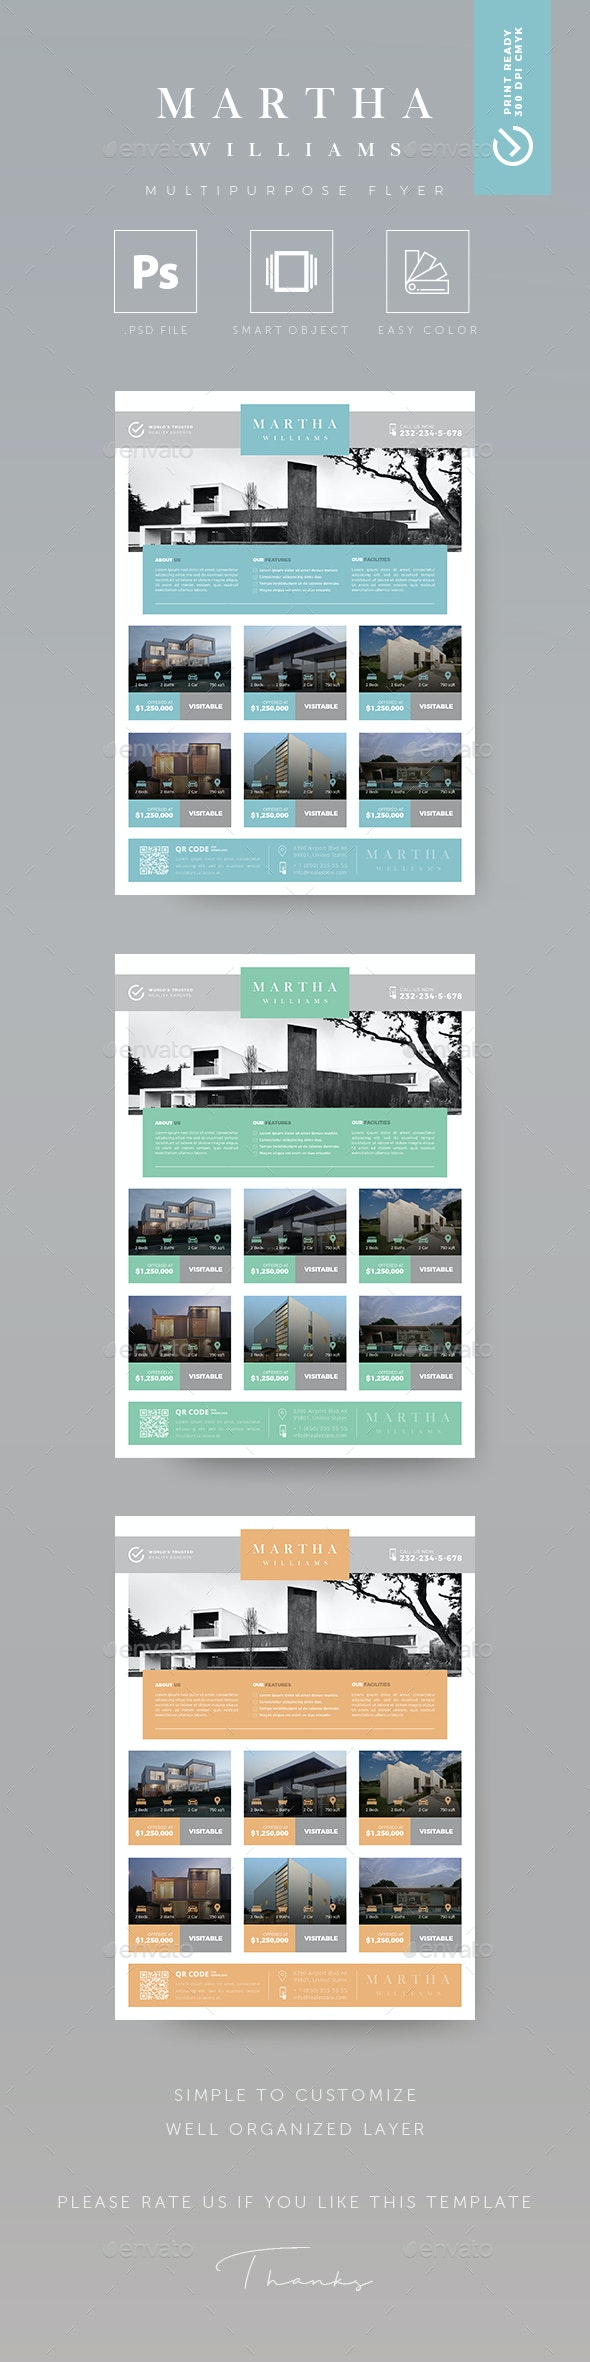 Minimalist - Creative Real Estate Flyer - Flyers Print Templates